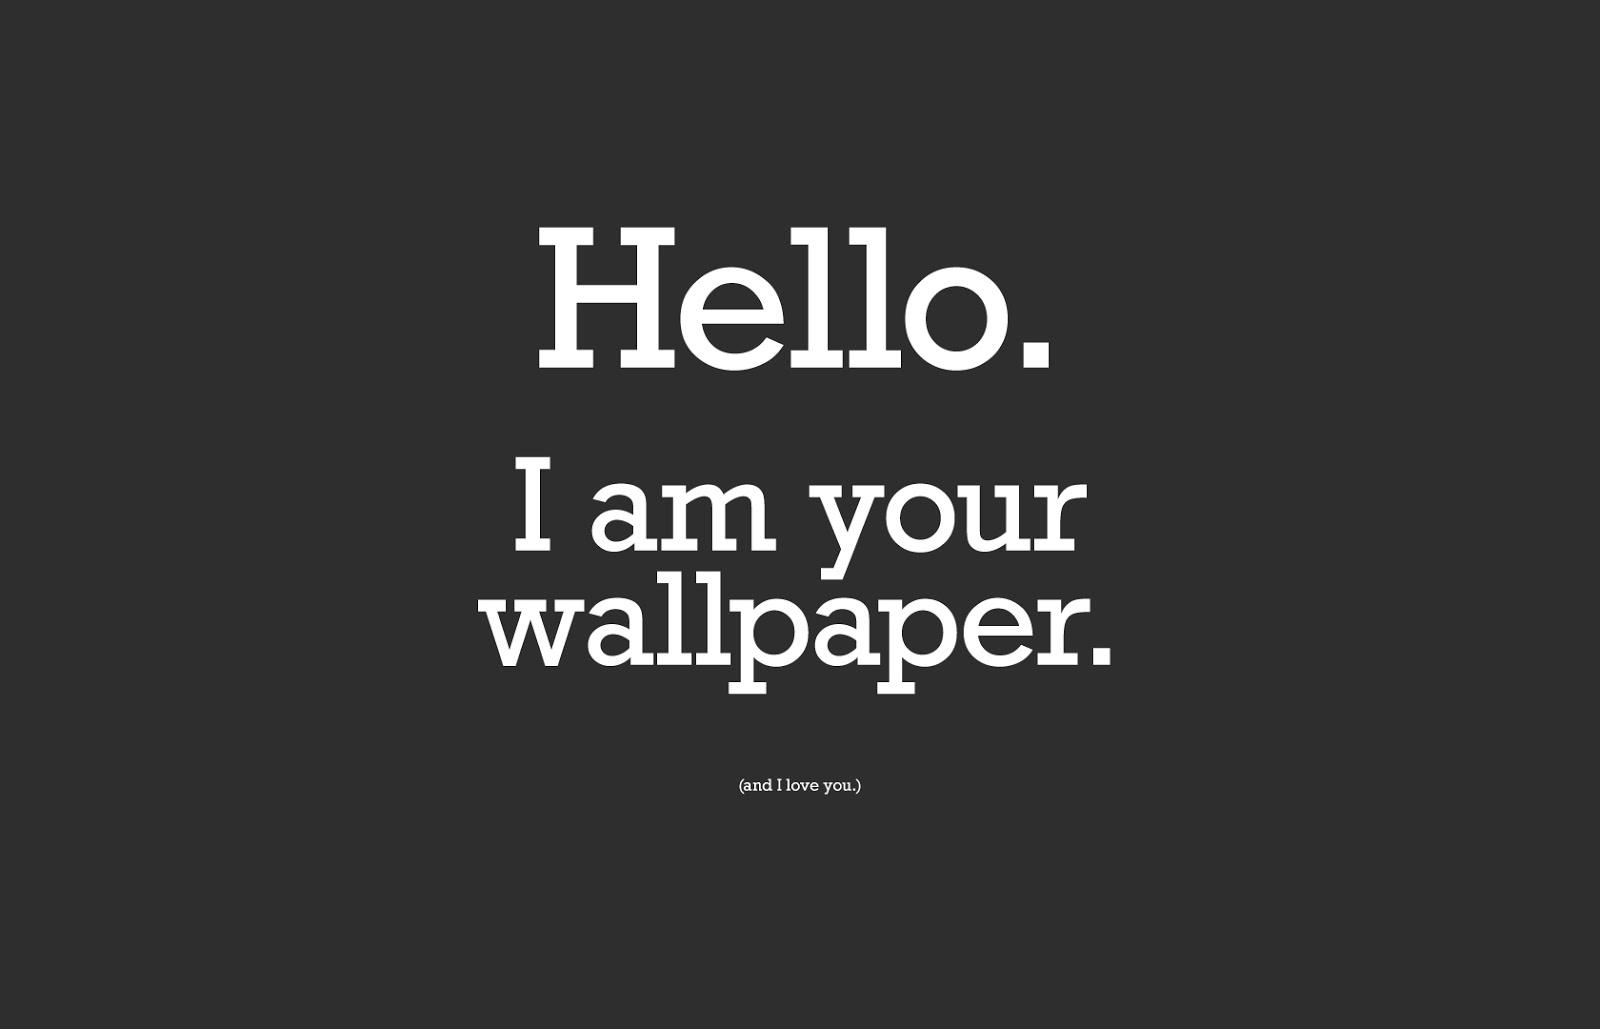 Wallpaper Hd Tagalog Quotes Jokes Text 4 Wallpaper